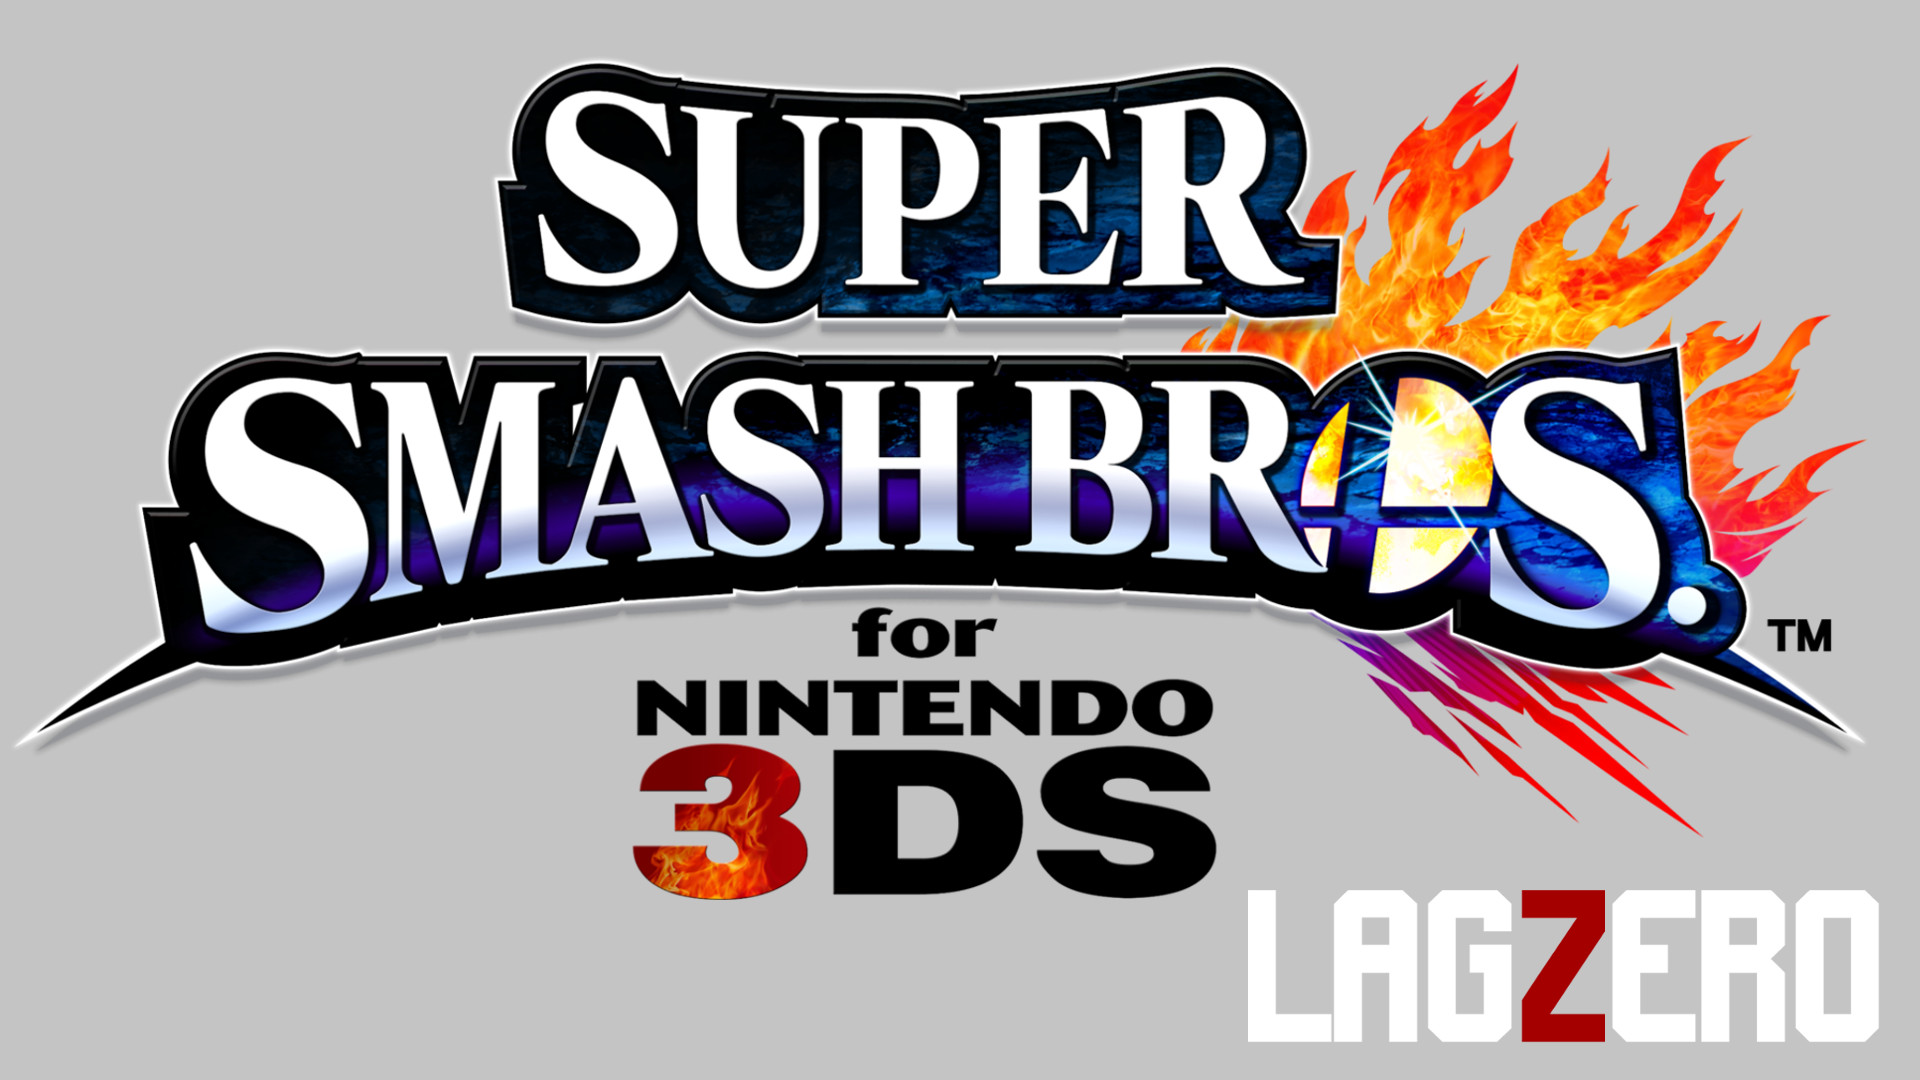 LagZero Analiza: Super Smash Bros 3DS [Review Portatil]